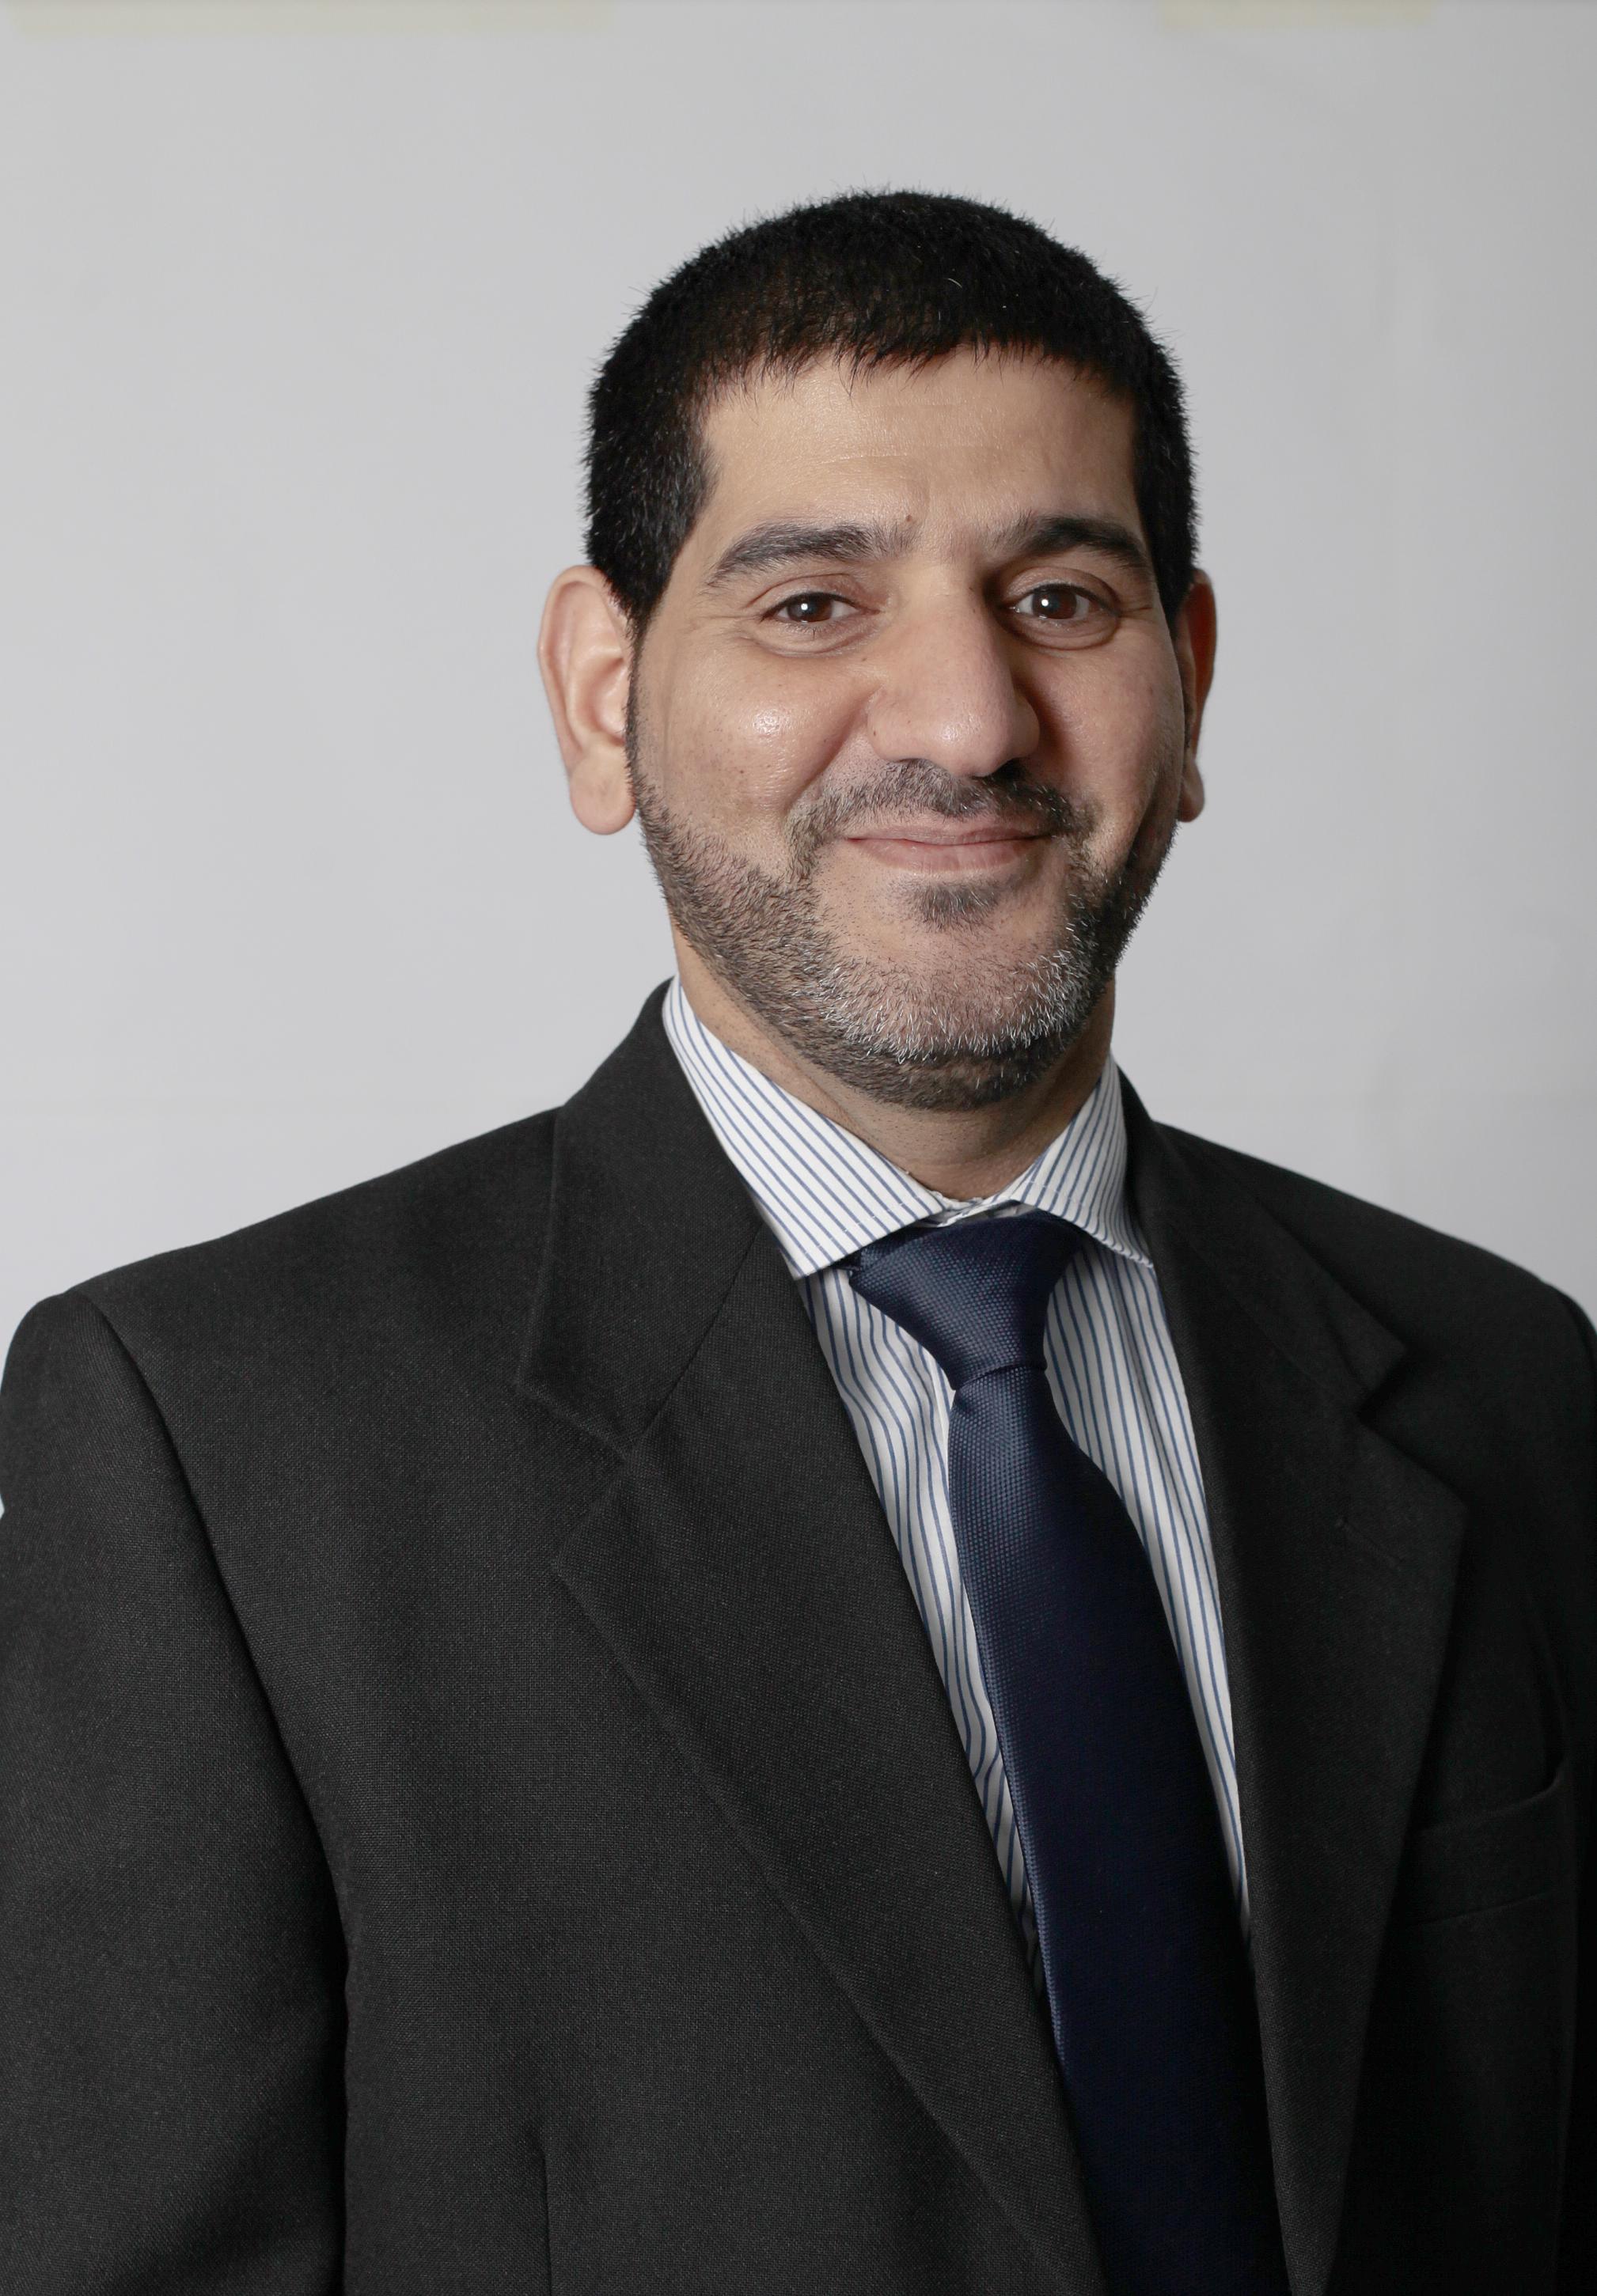 Yousif Faraj